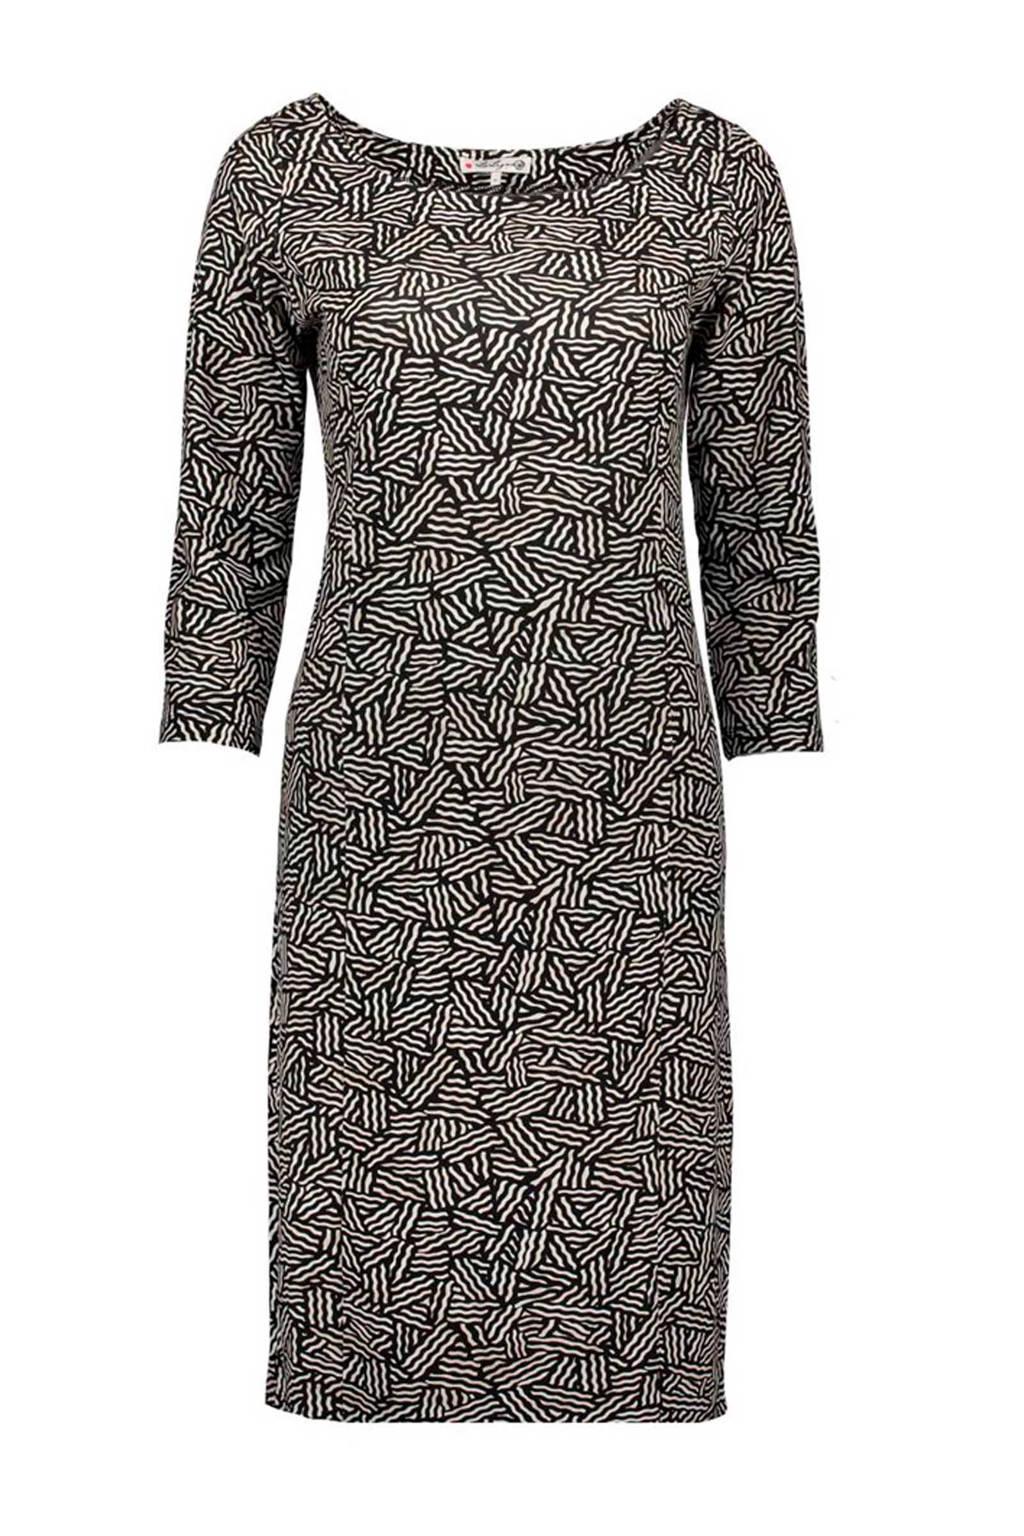 La Ligna jurk, Zwart/ecru